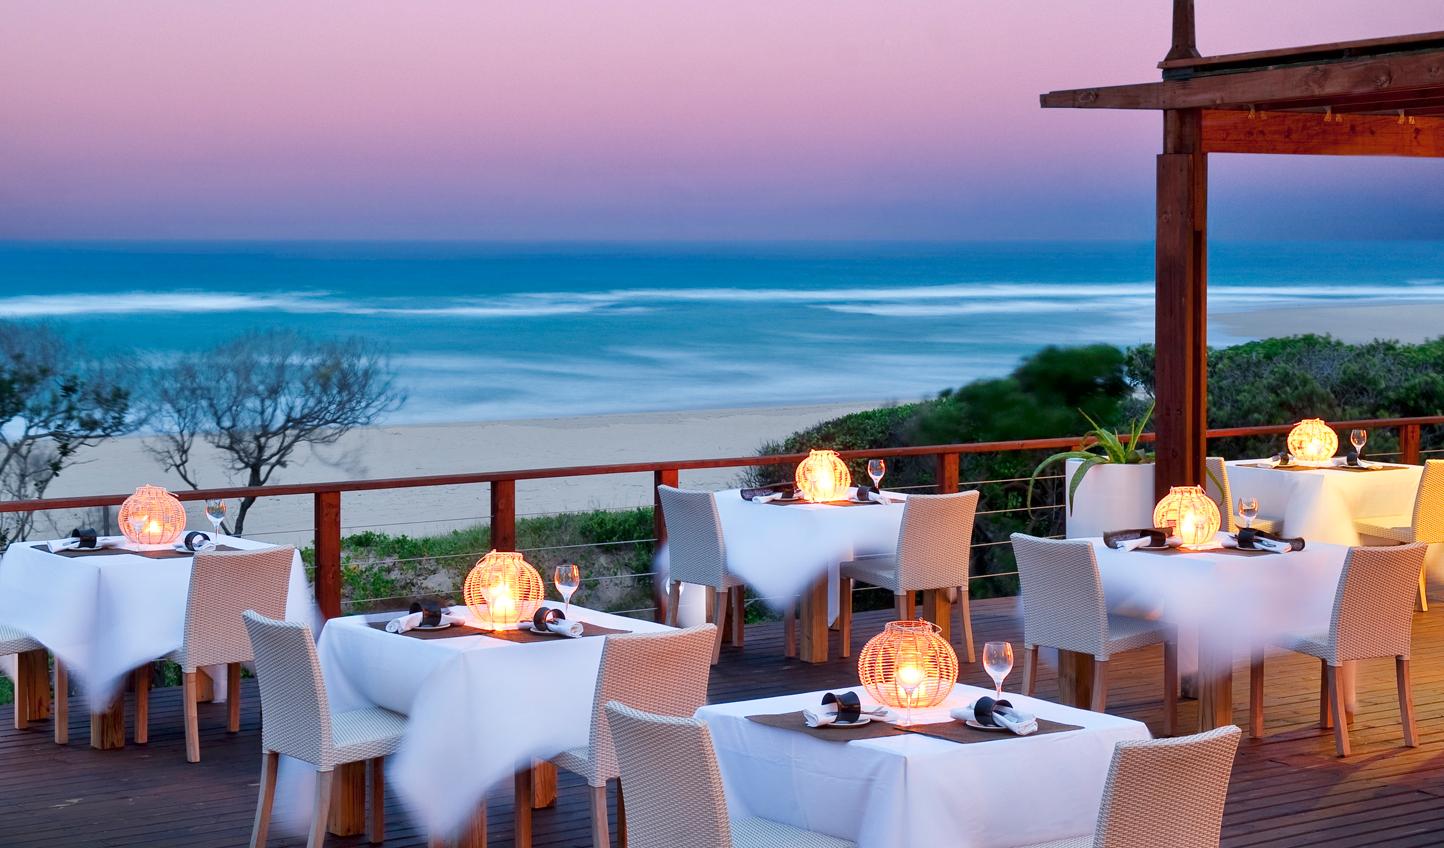 The resort restaurant specializes in Mozambique delicacies